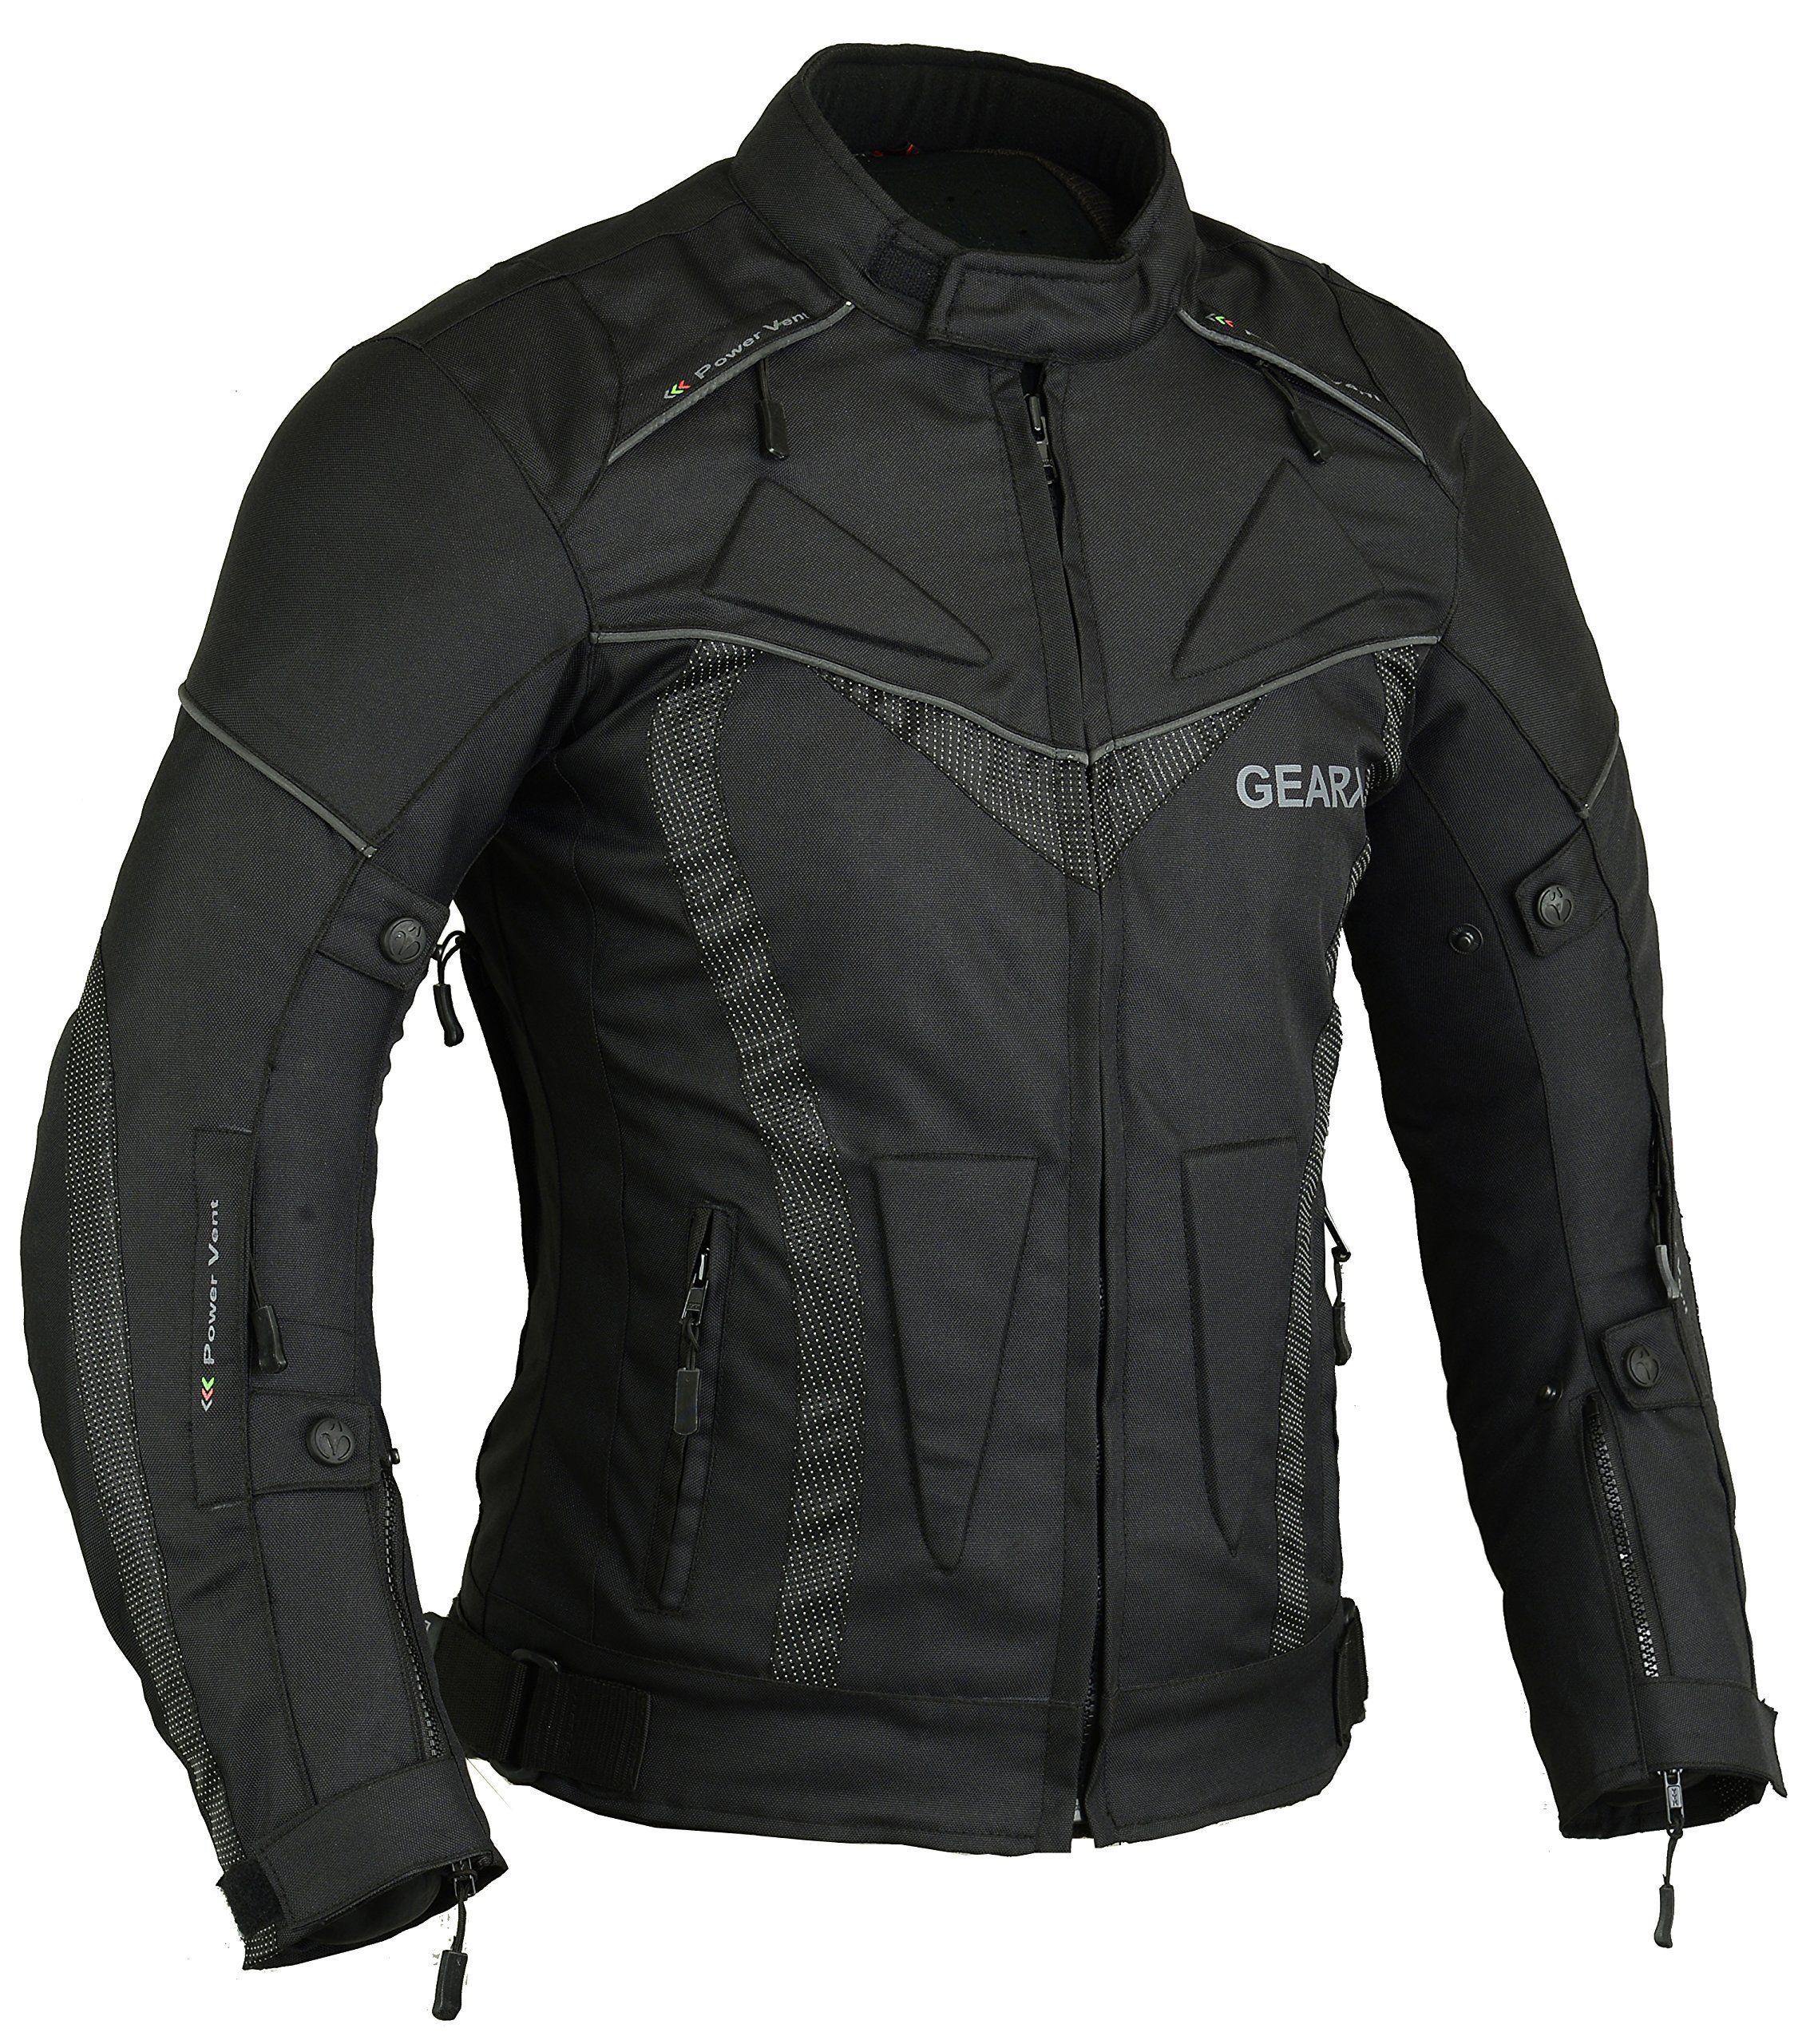 Alpinestars Smx S Mx Plus Black White Motorcycle Racing Amp Sport Boots - Biker gear